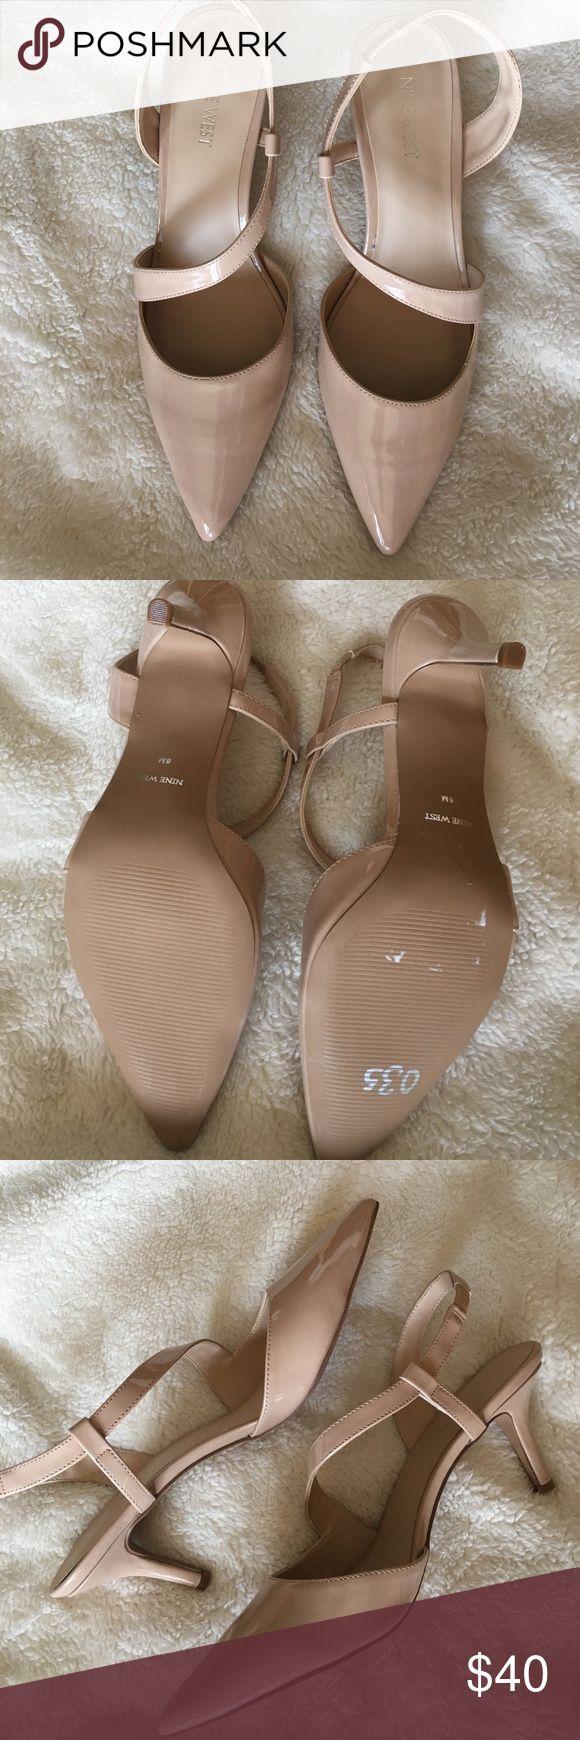 NINE WEST 8 NUDE SLINGBACK PUMPS NINE WEST brand new, never worn slingback pumps, size 8. Nude patent leather. Nine West Shoes Heels